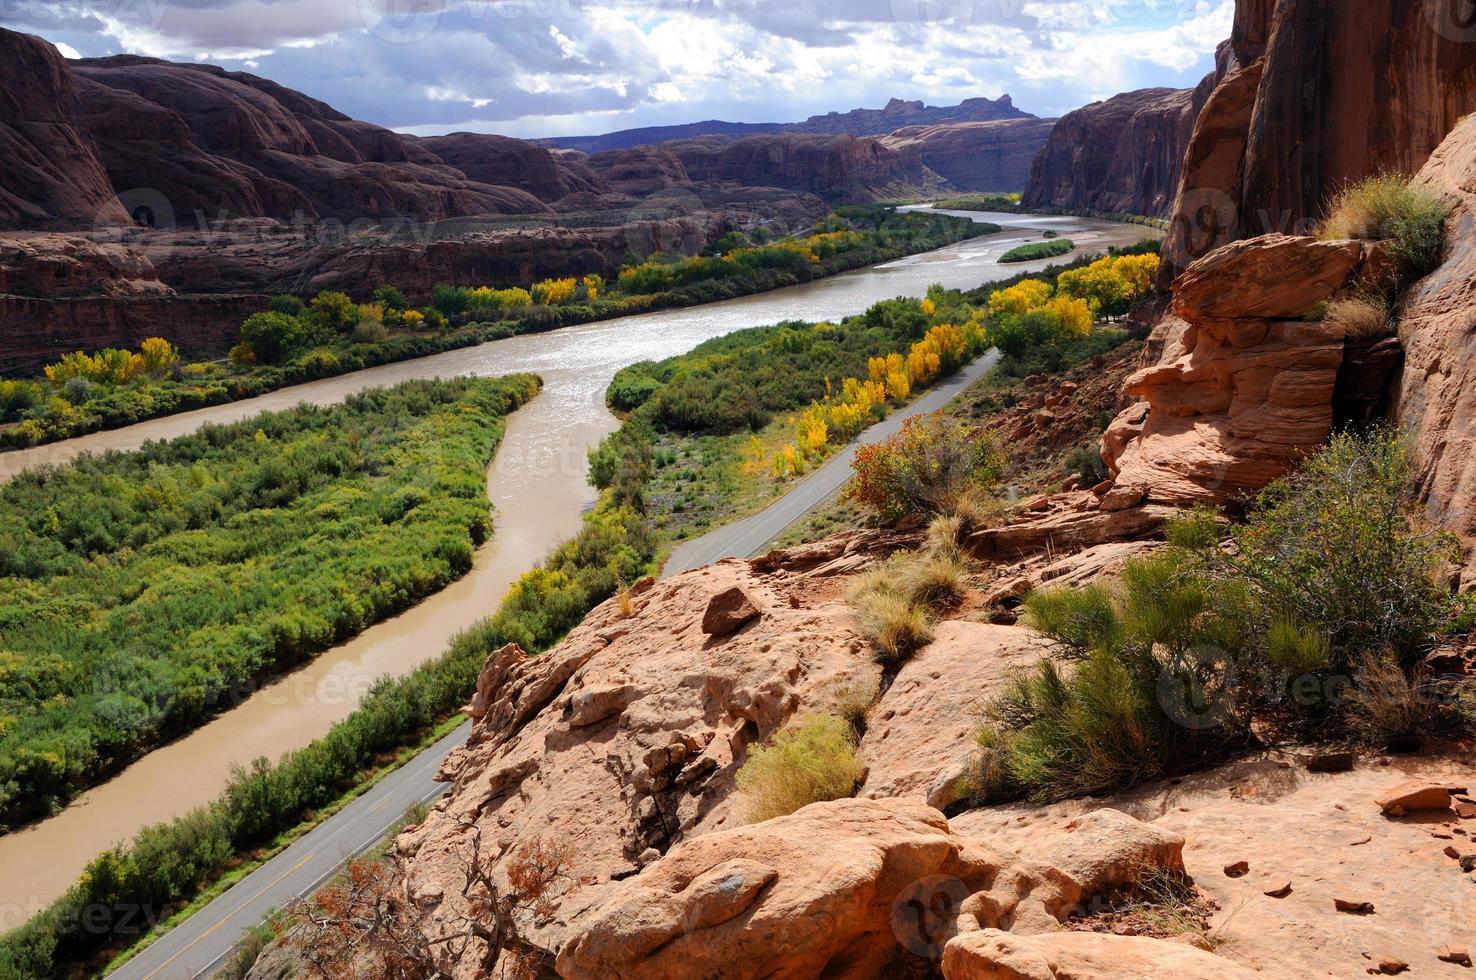 moab portaal uitzicht op de Colorado rivier foto